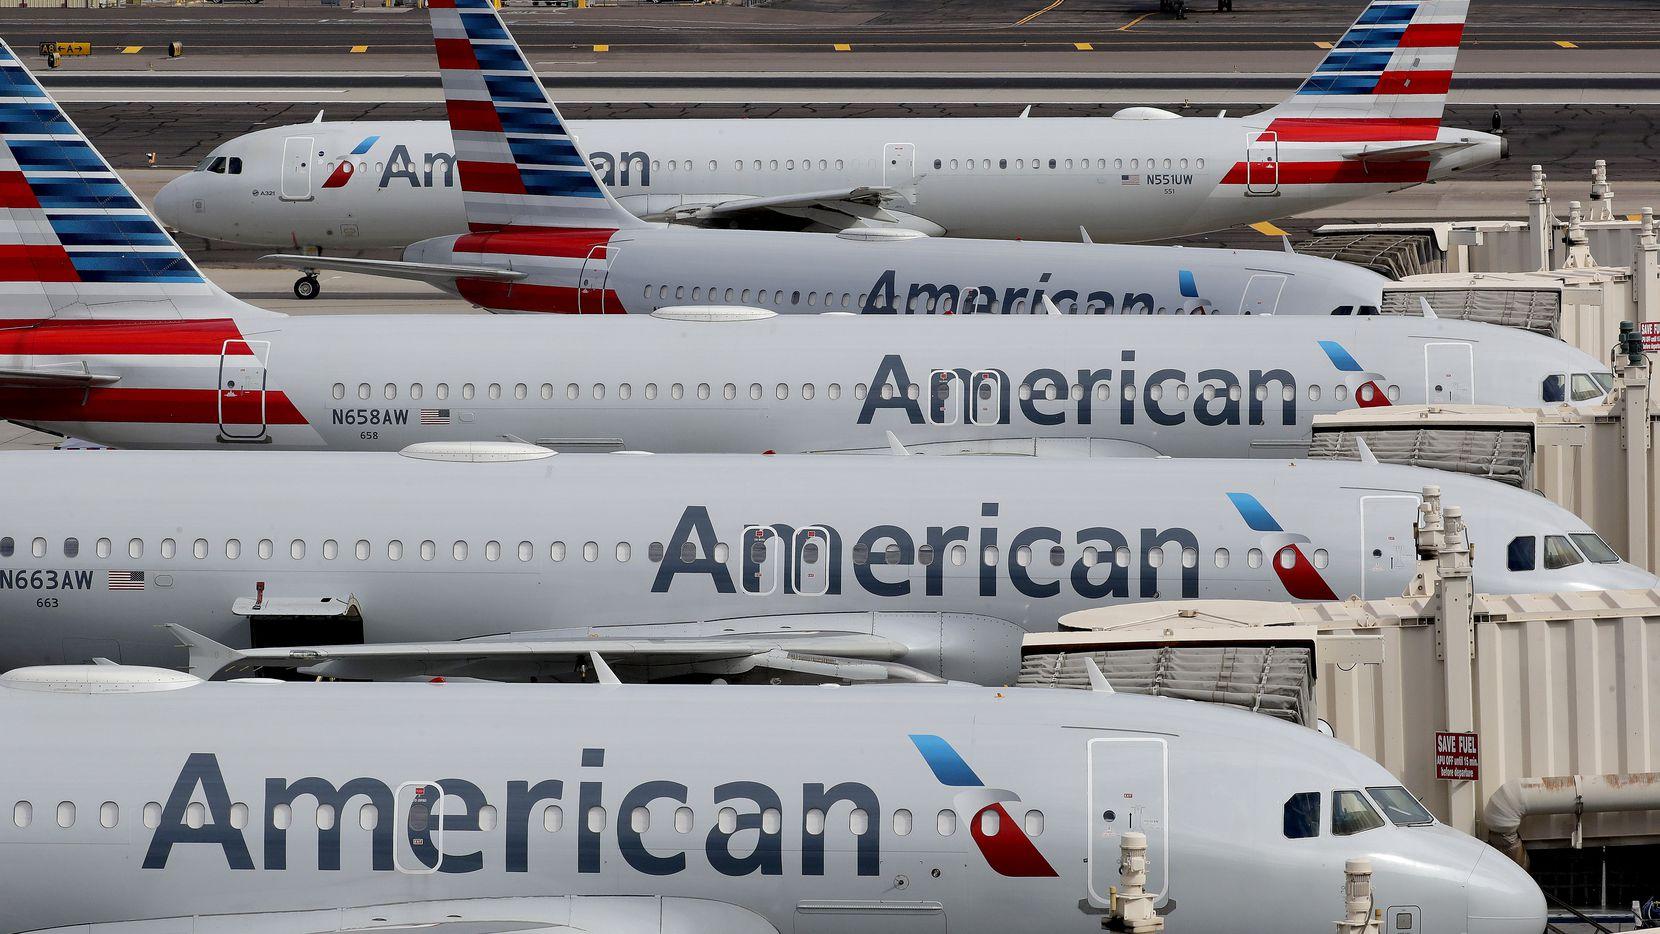 American - افزایش 2.8 درصدی سهام American Airlines در روز جمعه